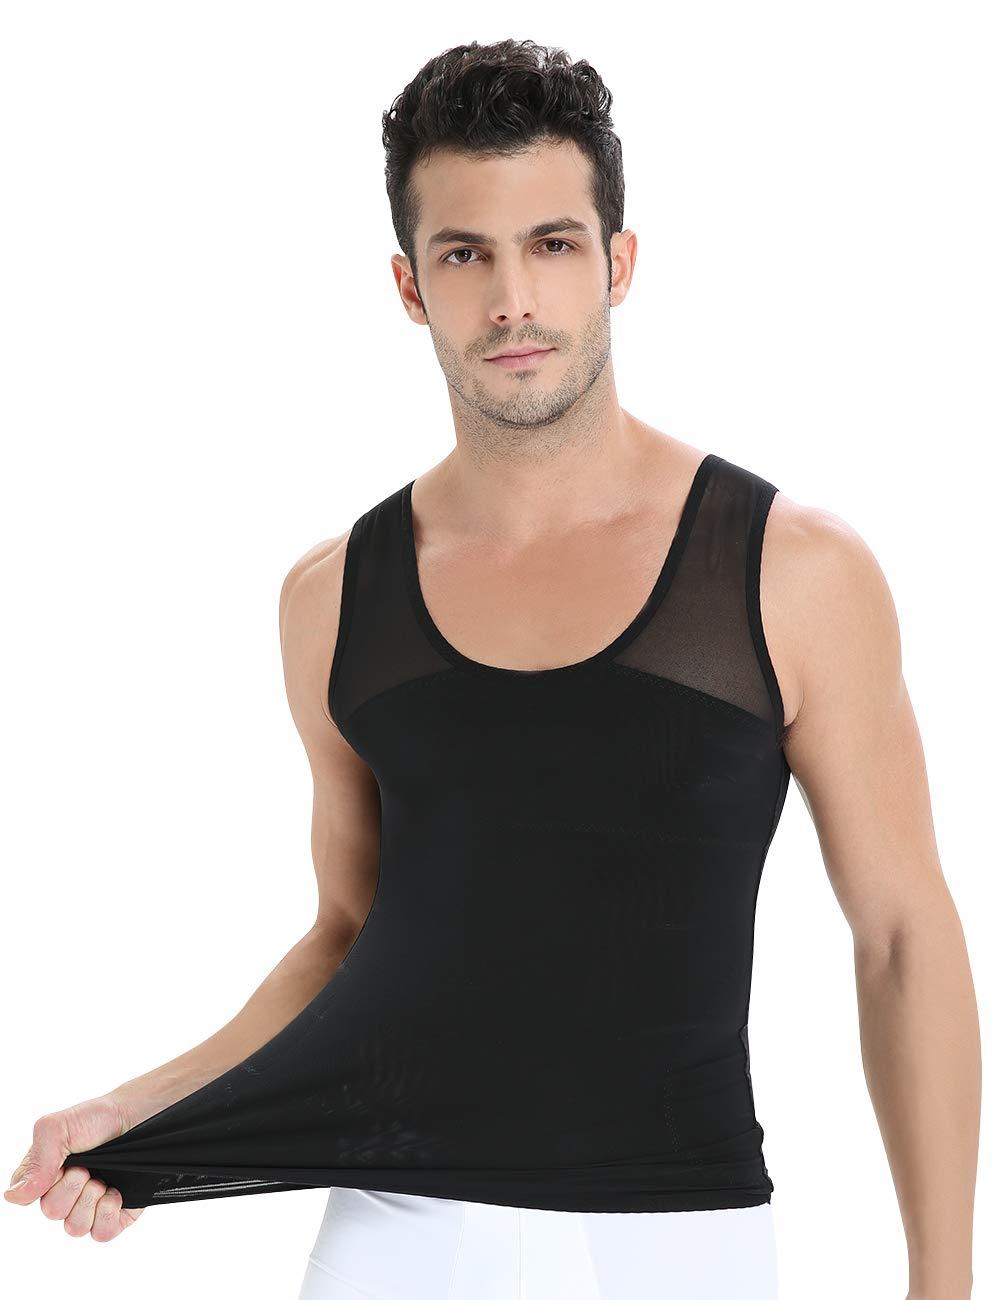 Roacoa Slimming Body Shaper for Men, Tummy Control and Gynecomastia Compression Undershirt (Medium, Black)